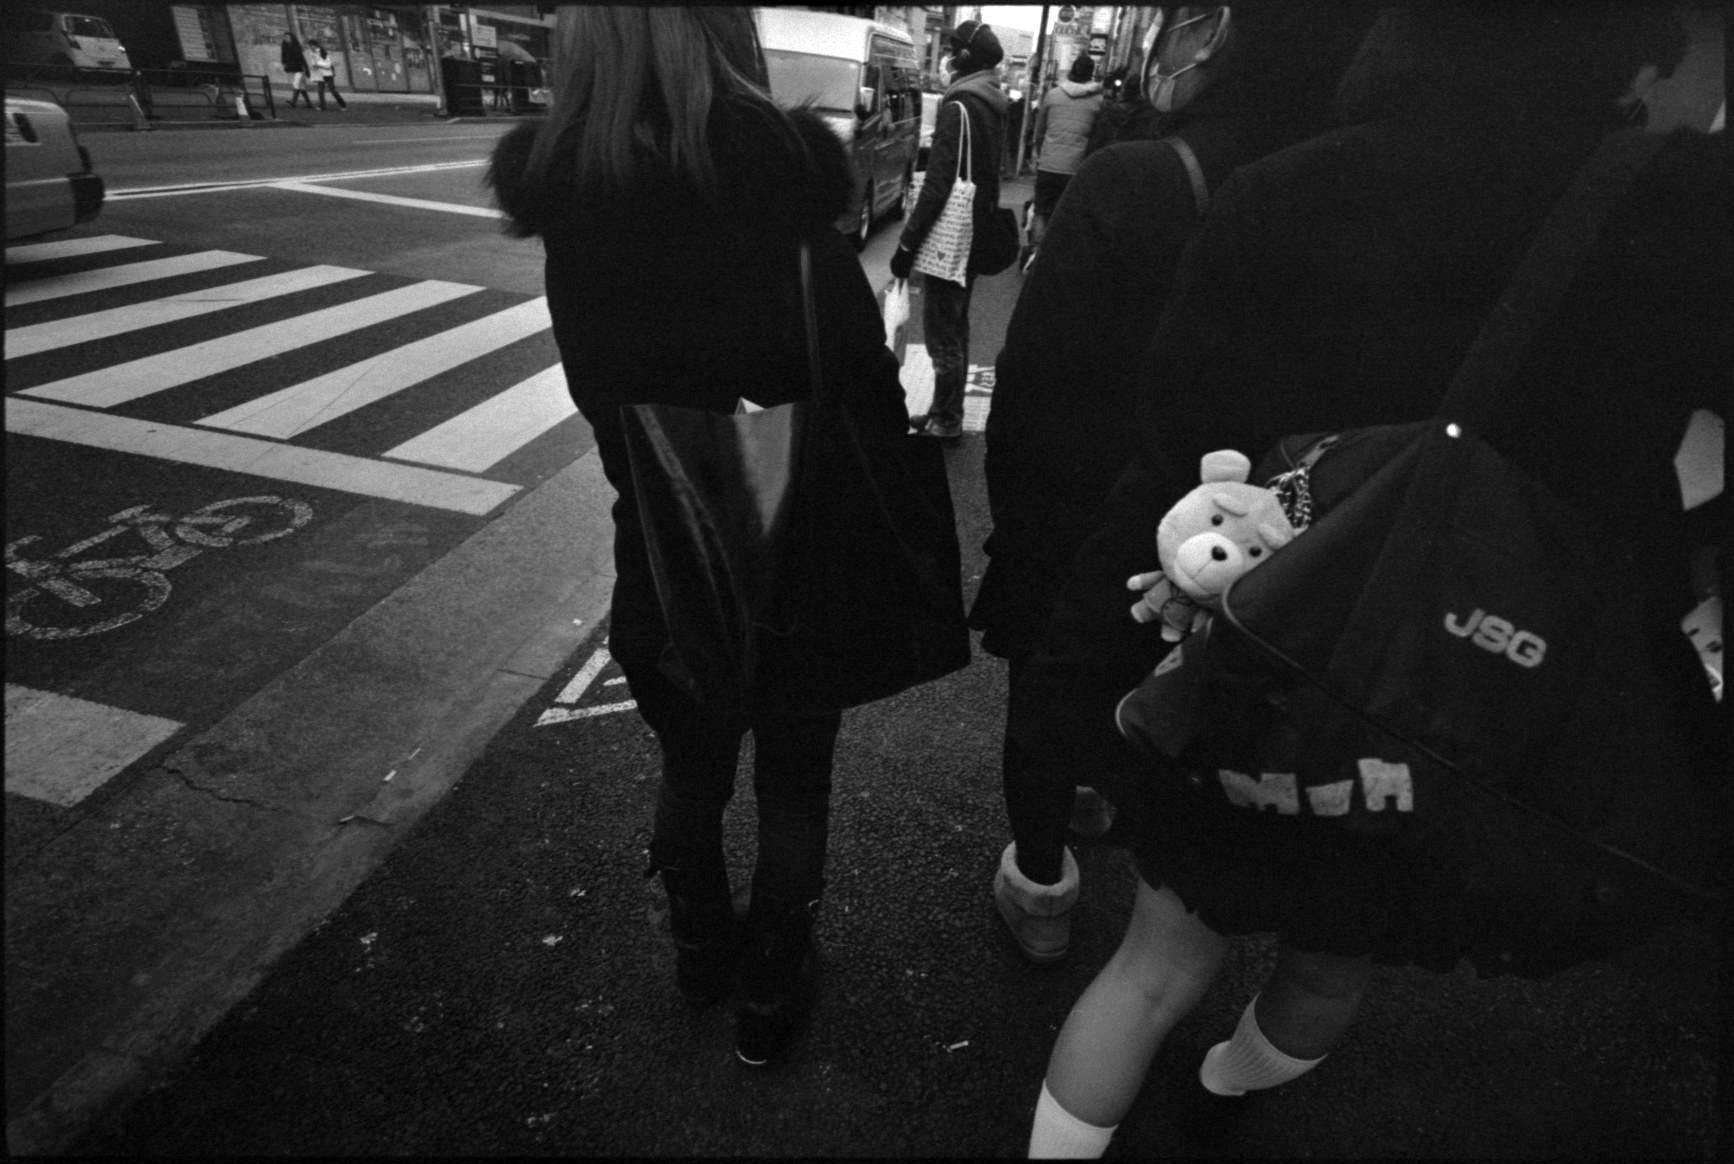 20140206 LeicaM4-P Distagon18 NP400 SPD StandDev 008